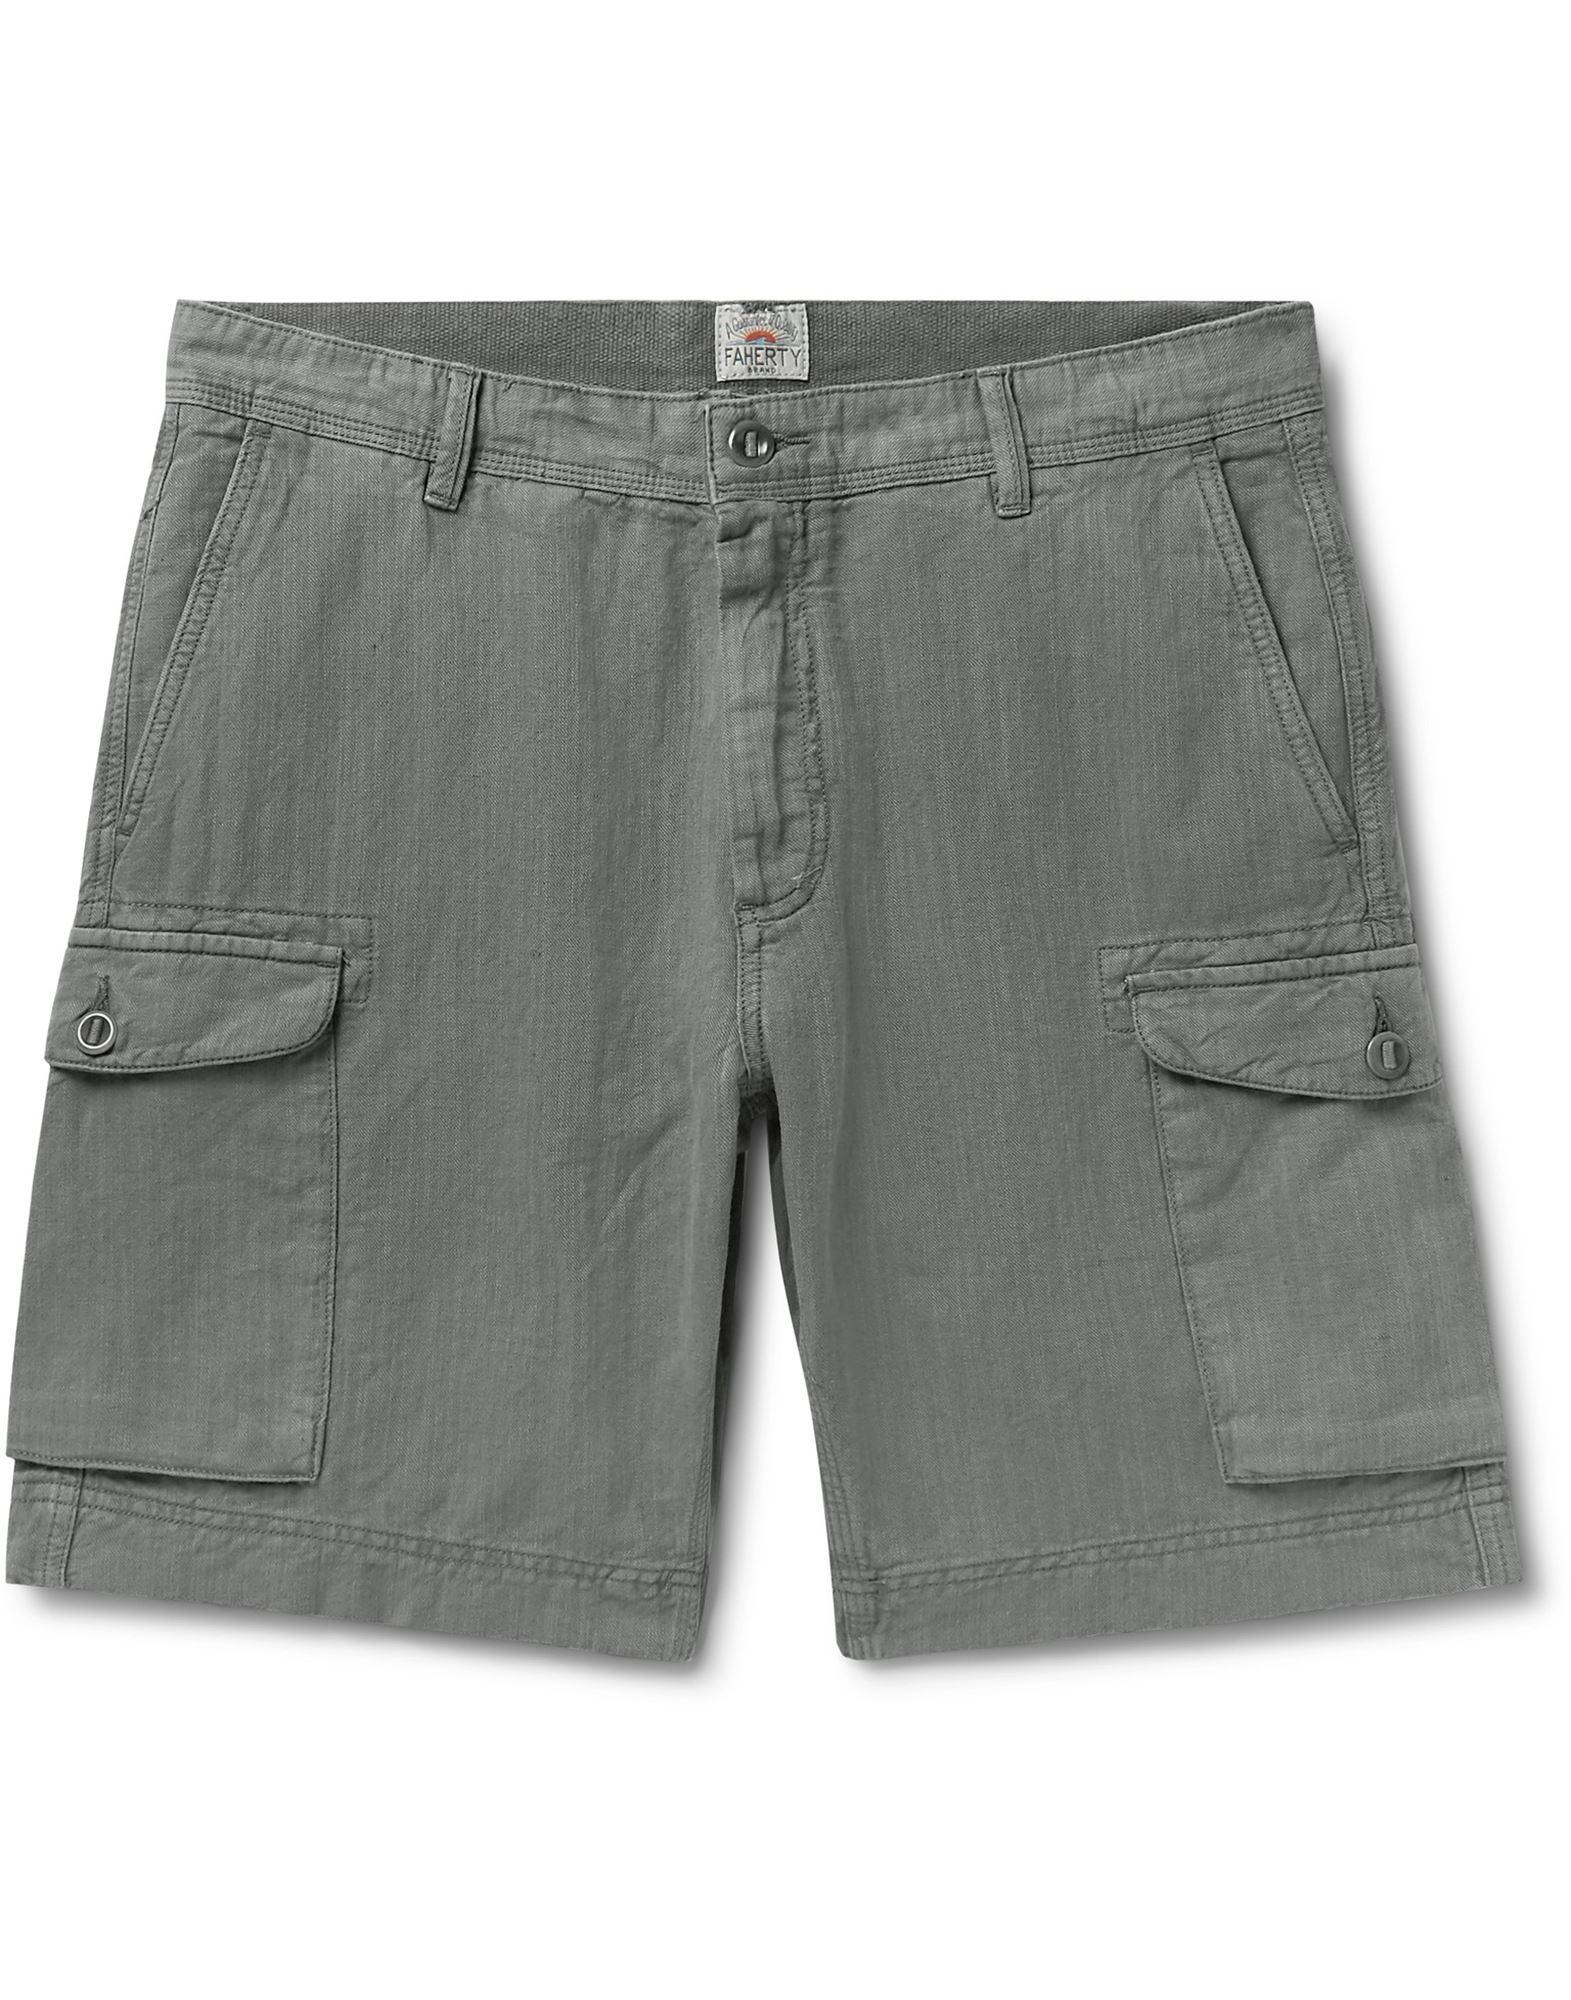 FAHERTY Bermudas. gabardine, solid color, no appliqués, mid rise, regular fit, straight leg, button, zip, multipockets. 58% Linen, 42% Cotton